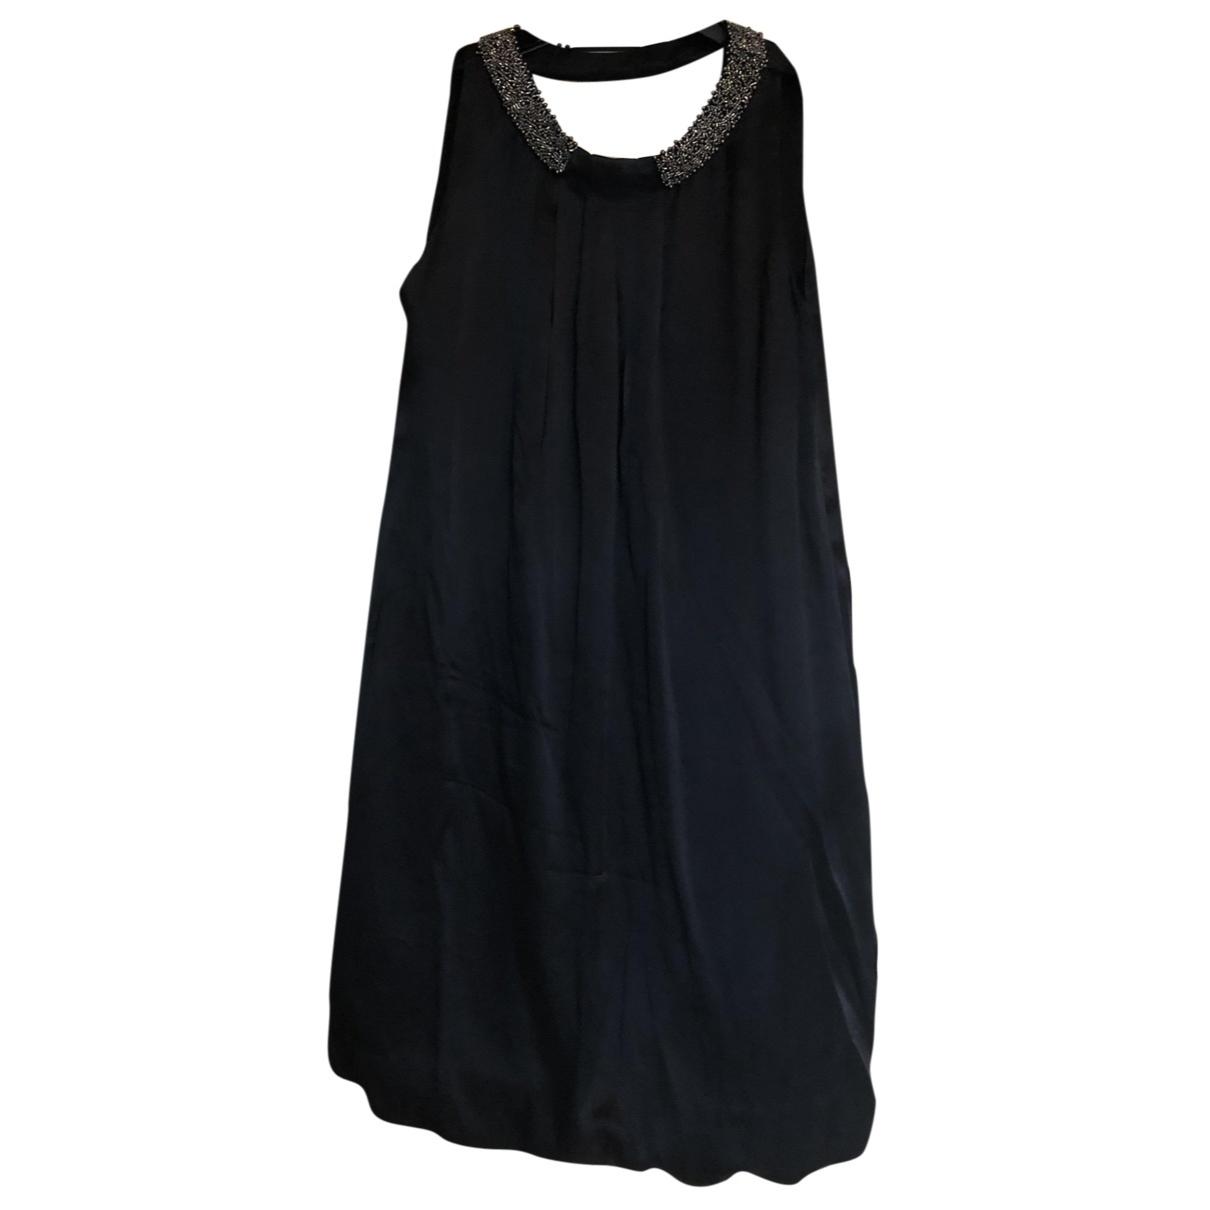 Massimo Dutti \N Black Silk dress for Women 8 US